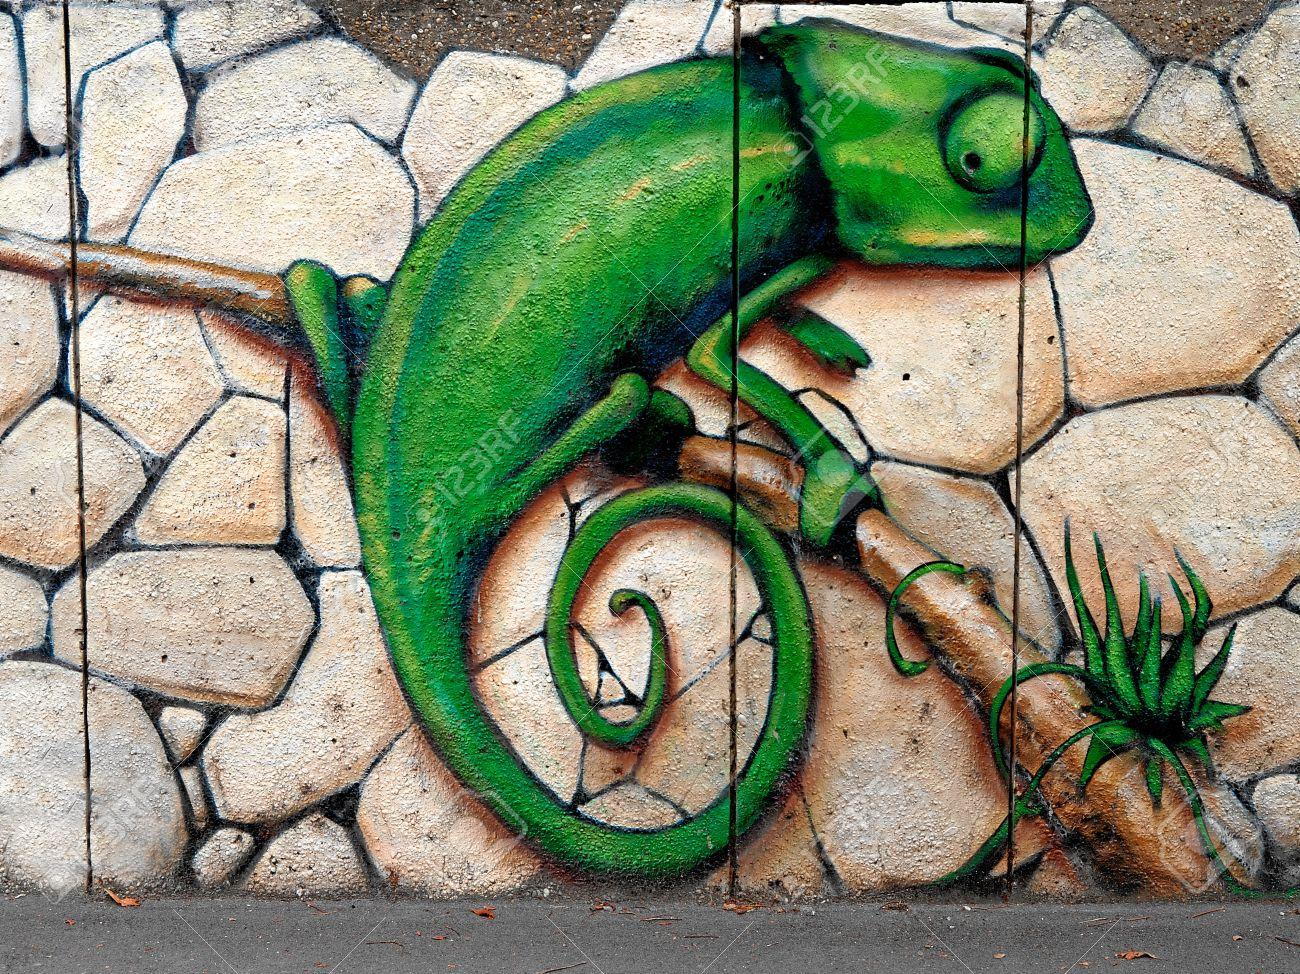 Grafitti wall painting - Wall Painting Graffiti Chameleon Sprite Graffiti Fest 2011 Sofia Bulgaria Photo